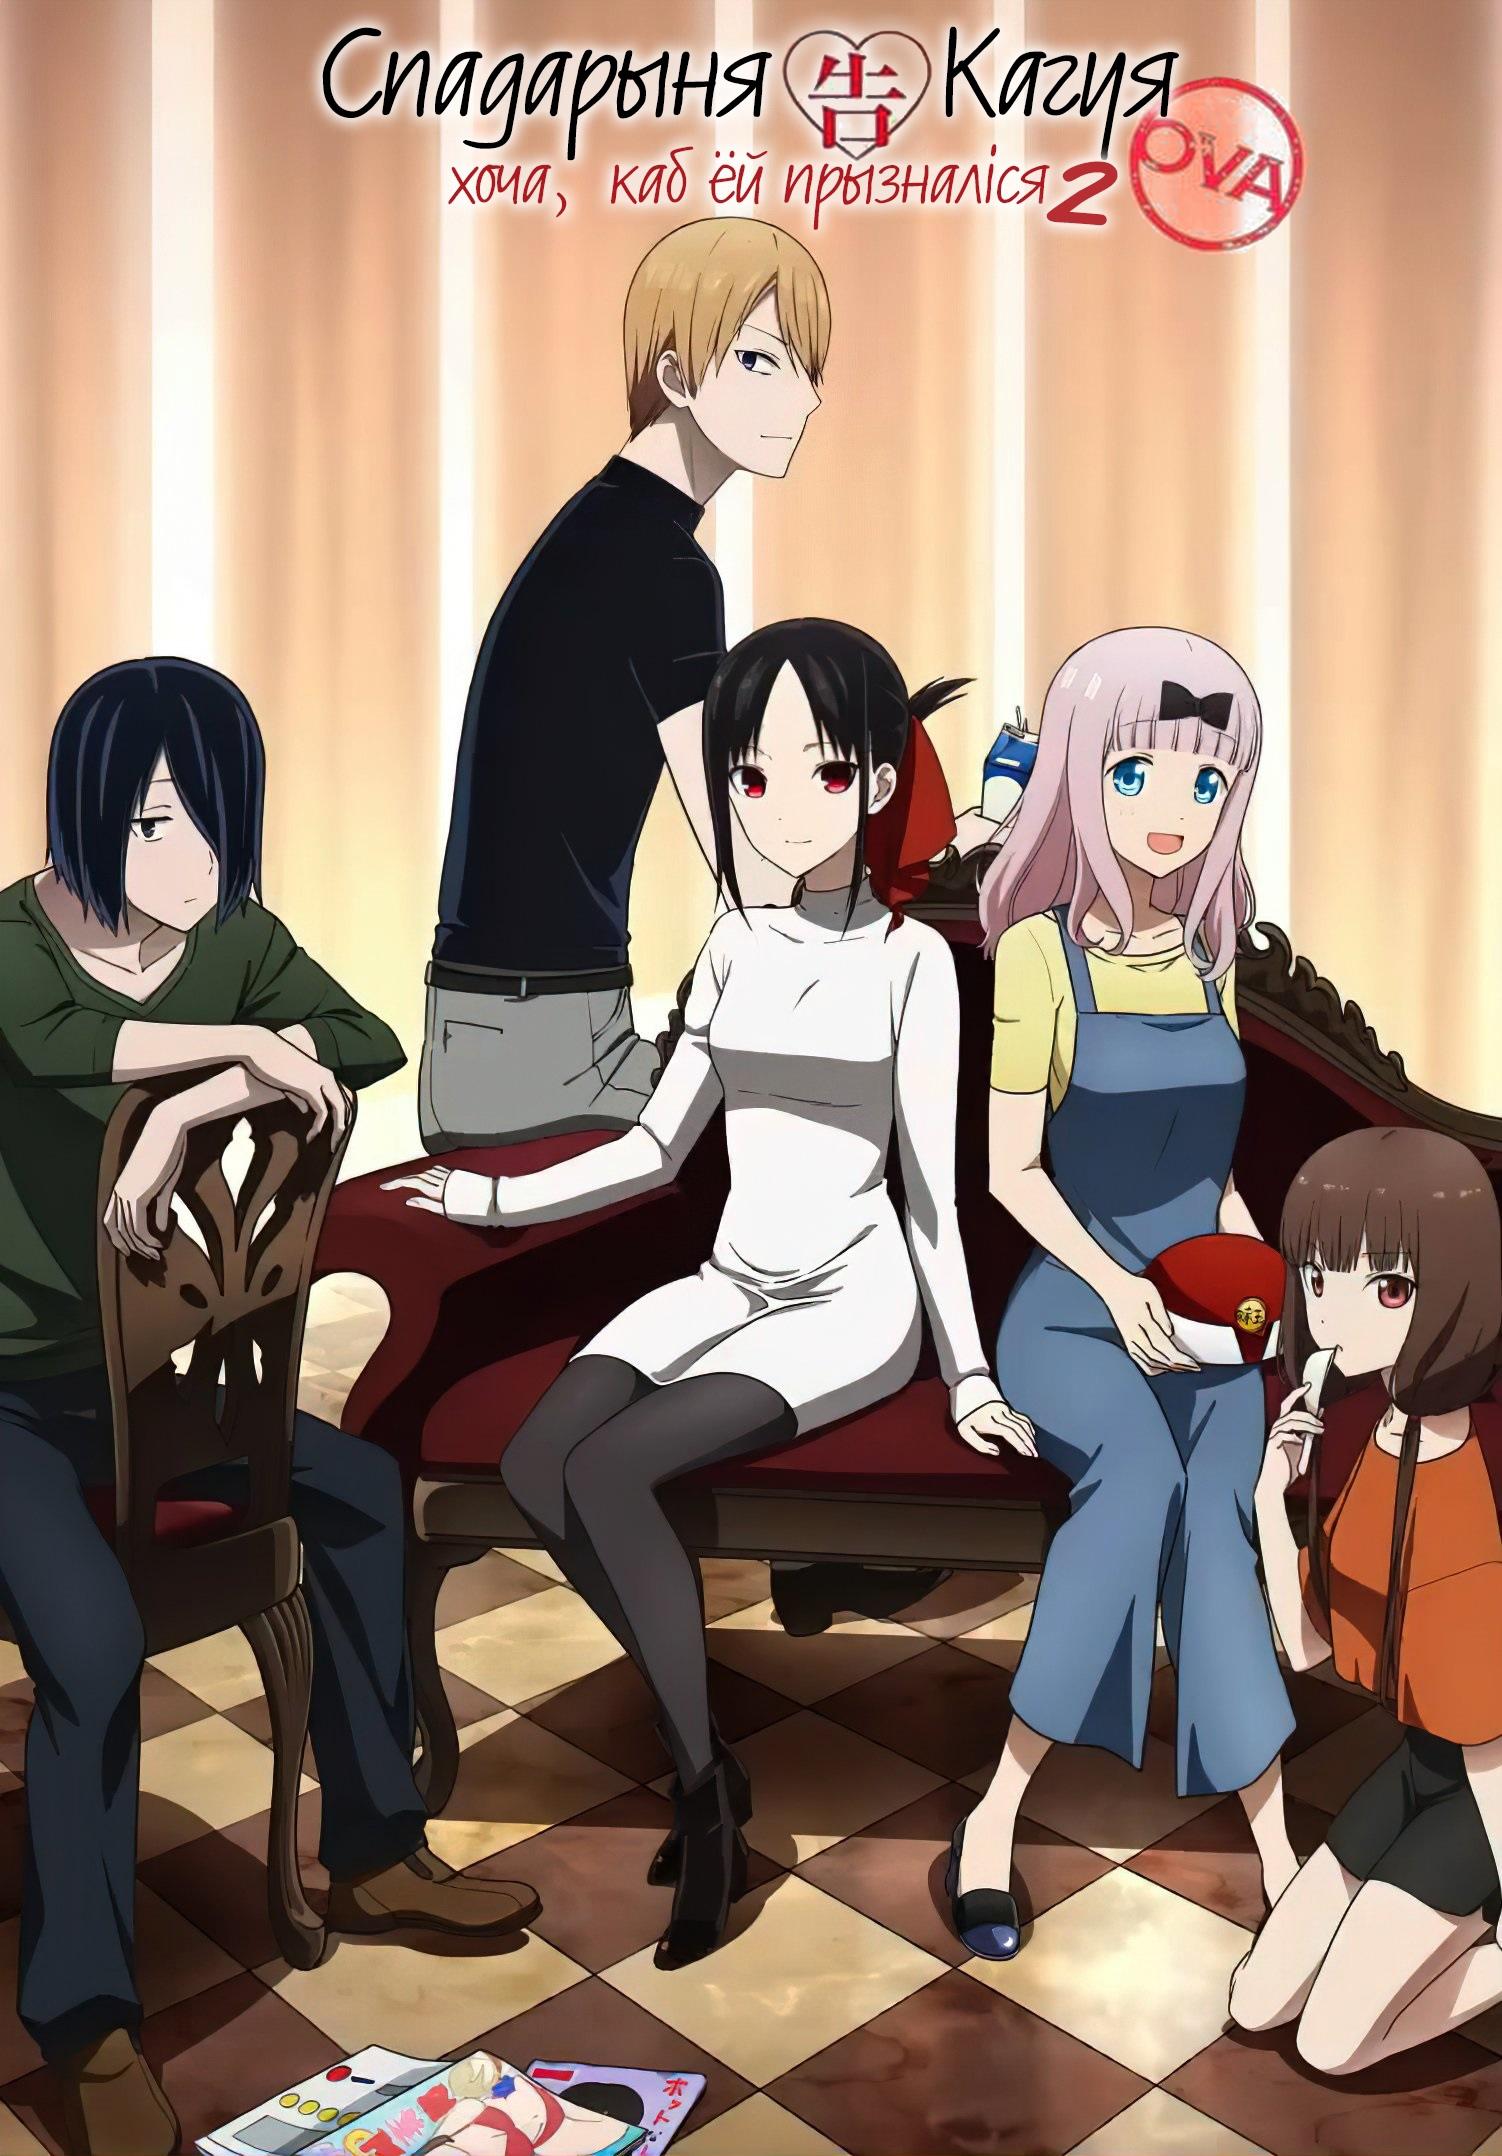 Kaguya-sama wa Kokurasetai?: Tensai-tachi no Renai Zunousen OVA, Спадарыня Кагуя хоча, каб ёй прызналіся 2 OVA, kaguya-sama-wa-kokurasetai:-tensai-tachi-no-renai-zunousen-ova